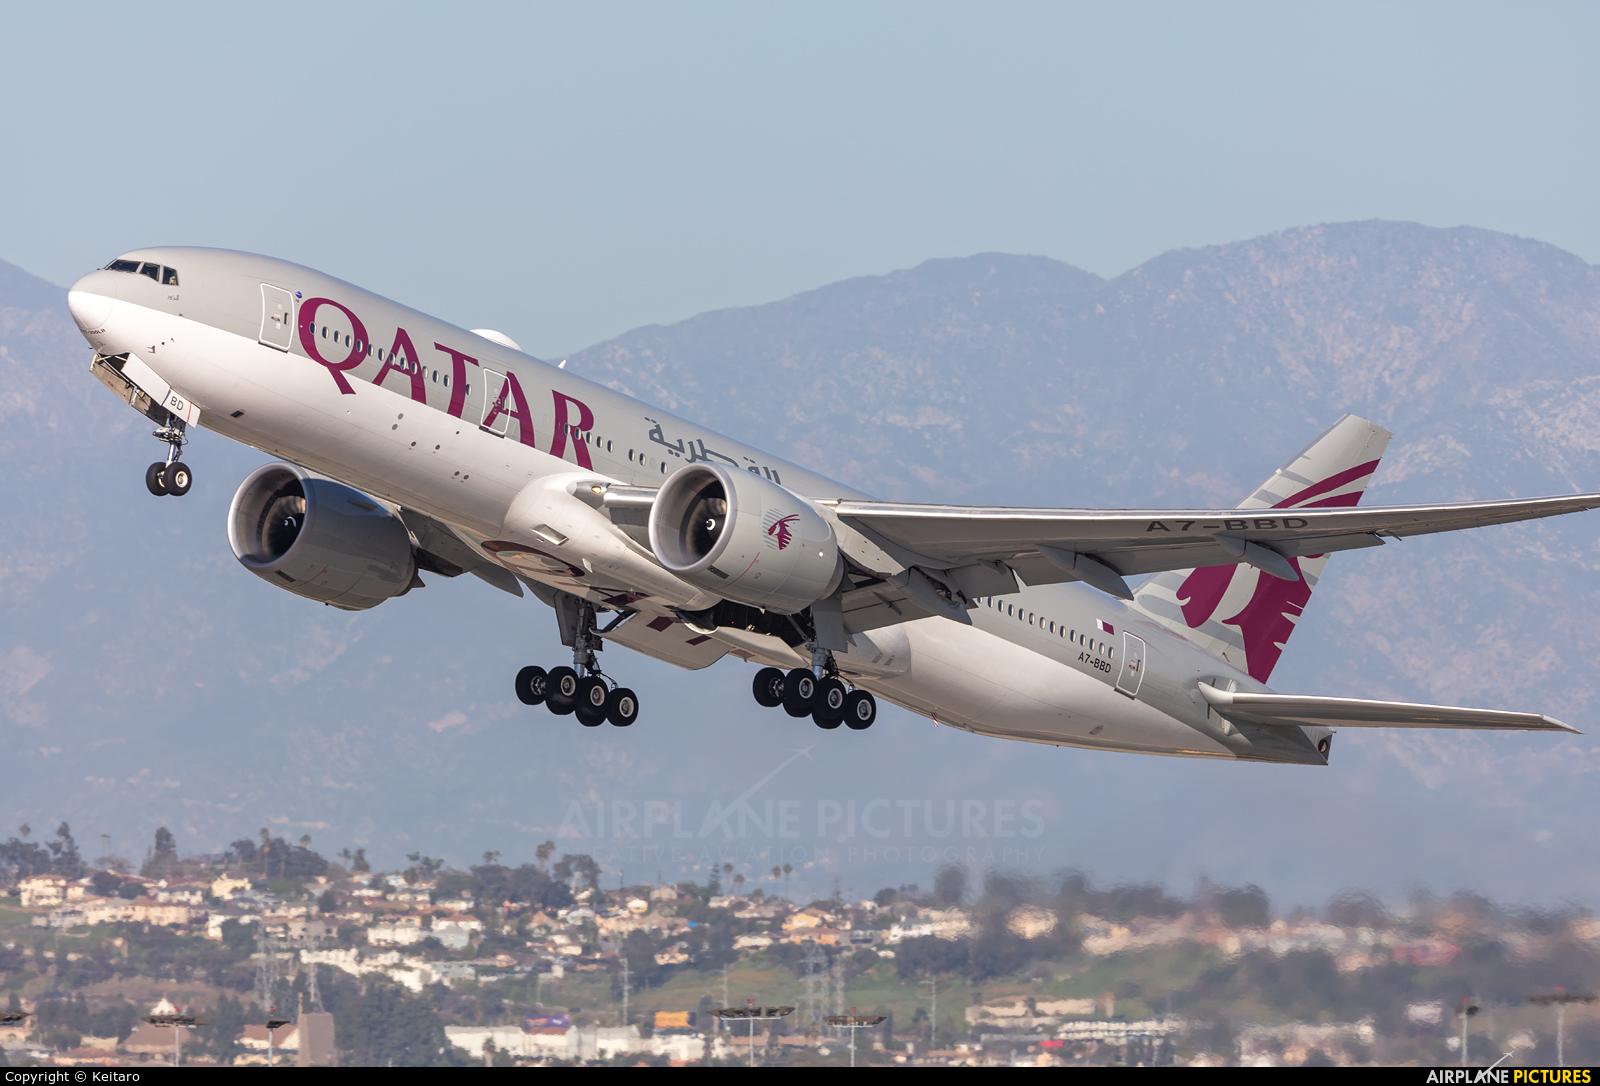 Qatar Airways A7-BBD aircraft at Los Angeles Intl